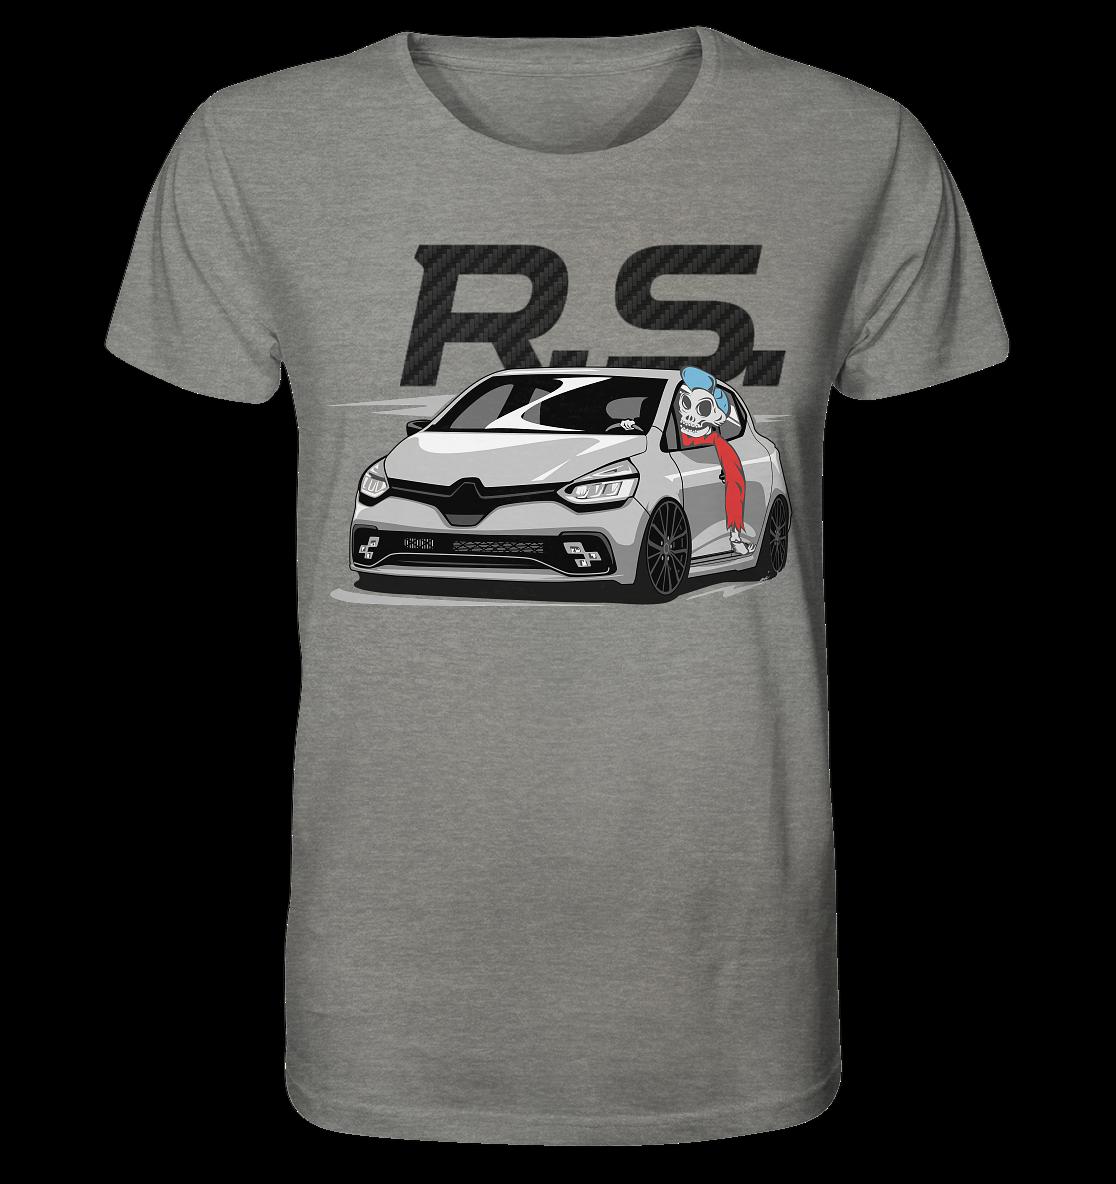 Glstkrrn Clio 4 Rs, camiseta Fase 2